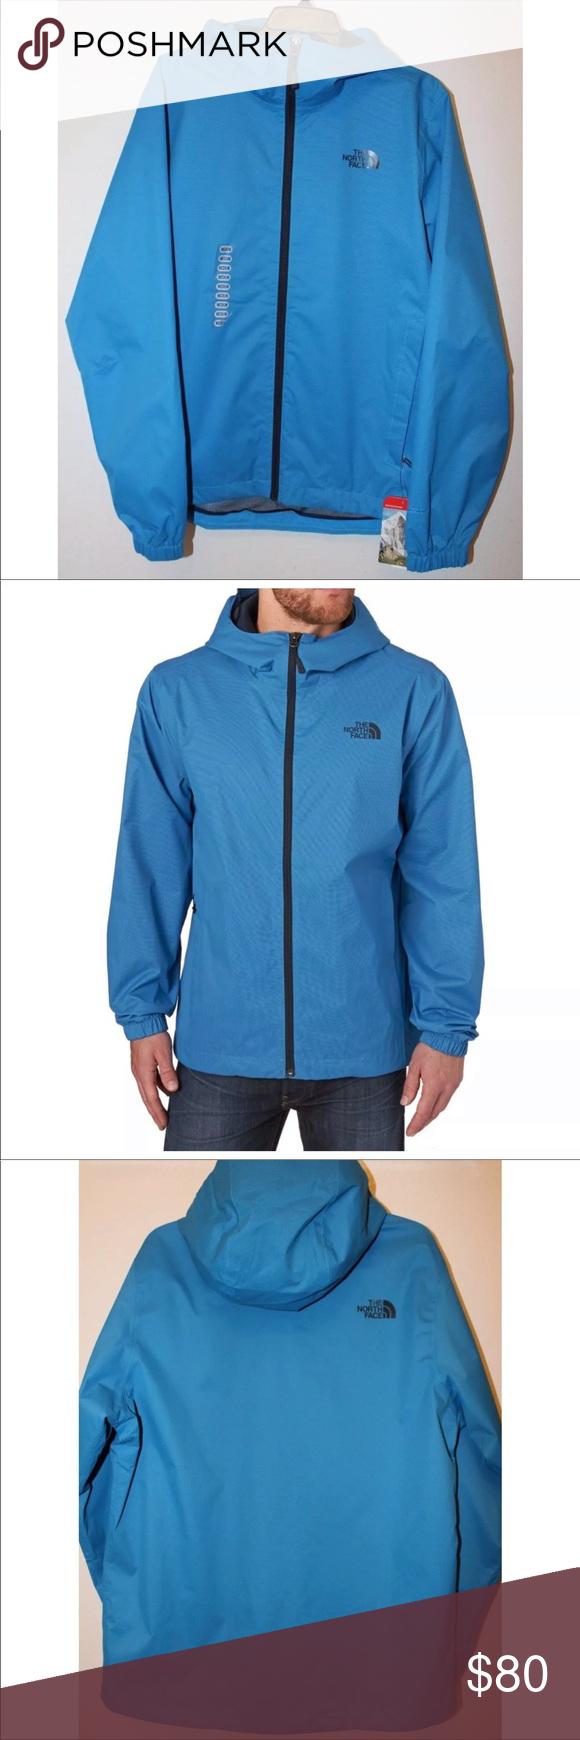 The North Face Men S Quest Waterproof Jacket Blue Waterproof Jacket North Face Mens Jackets [ 1740 x 580 Pixel ]